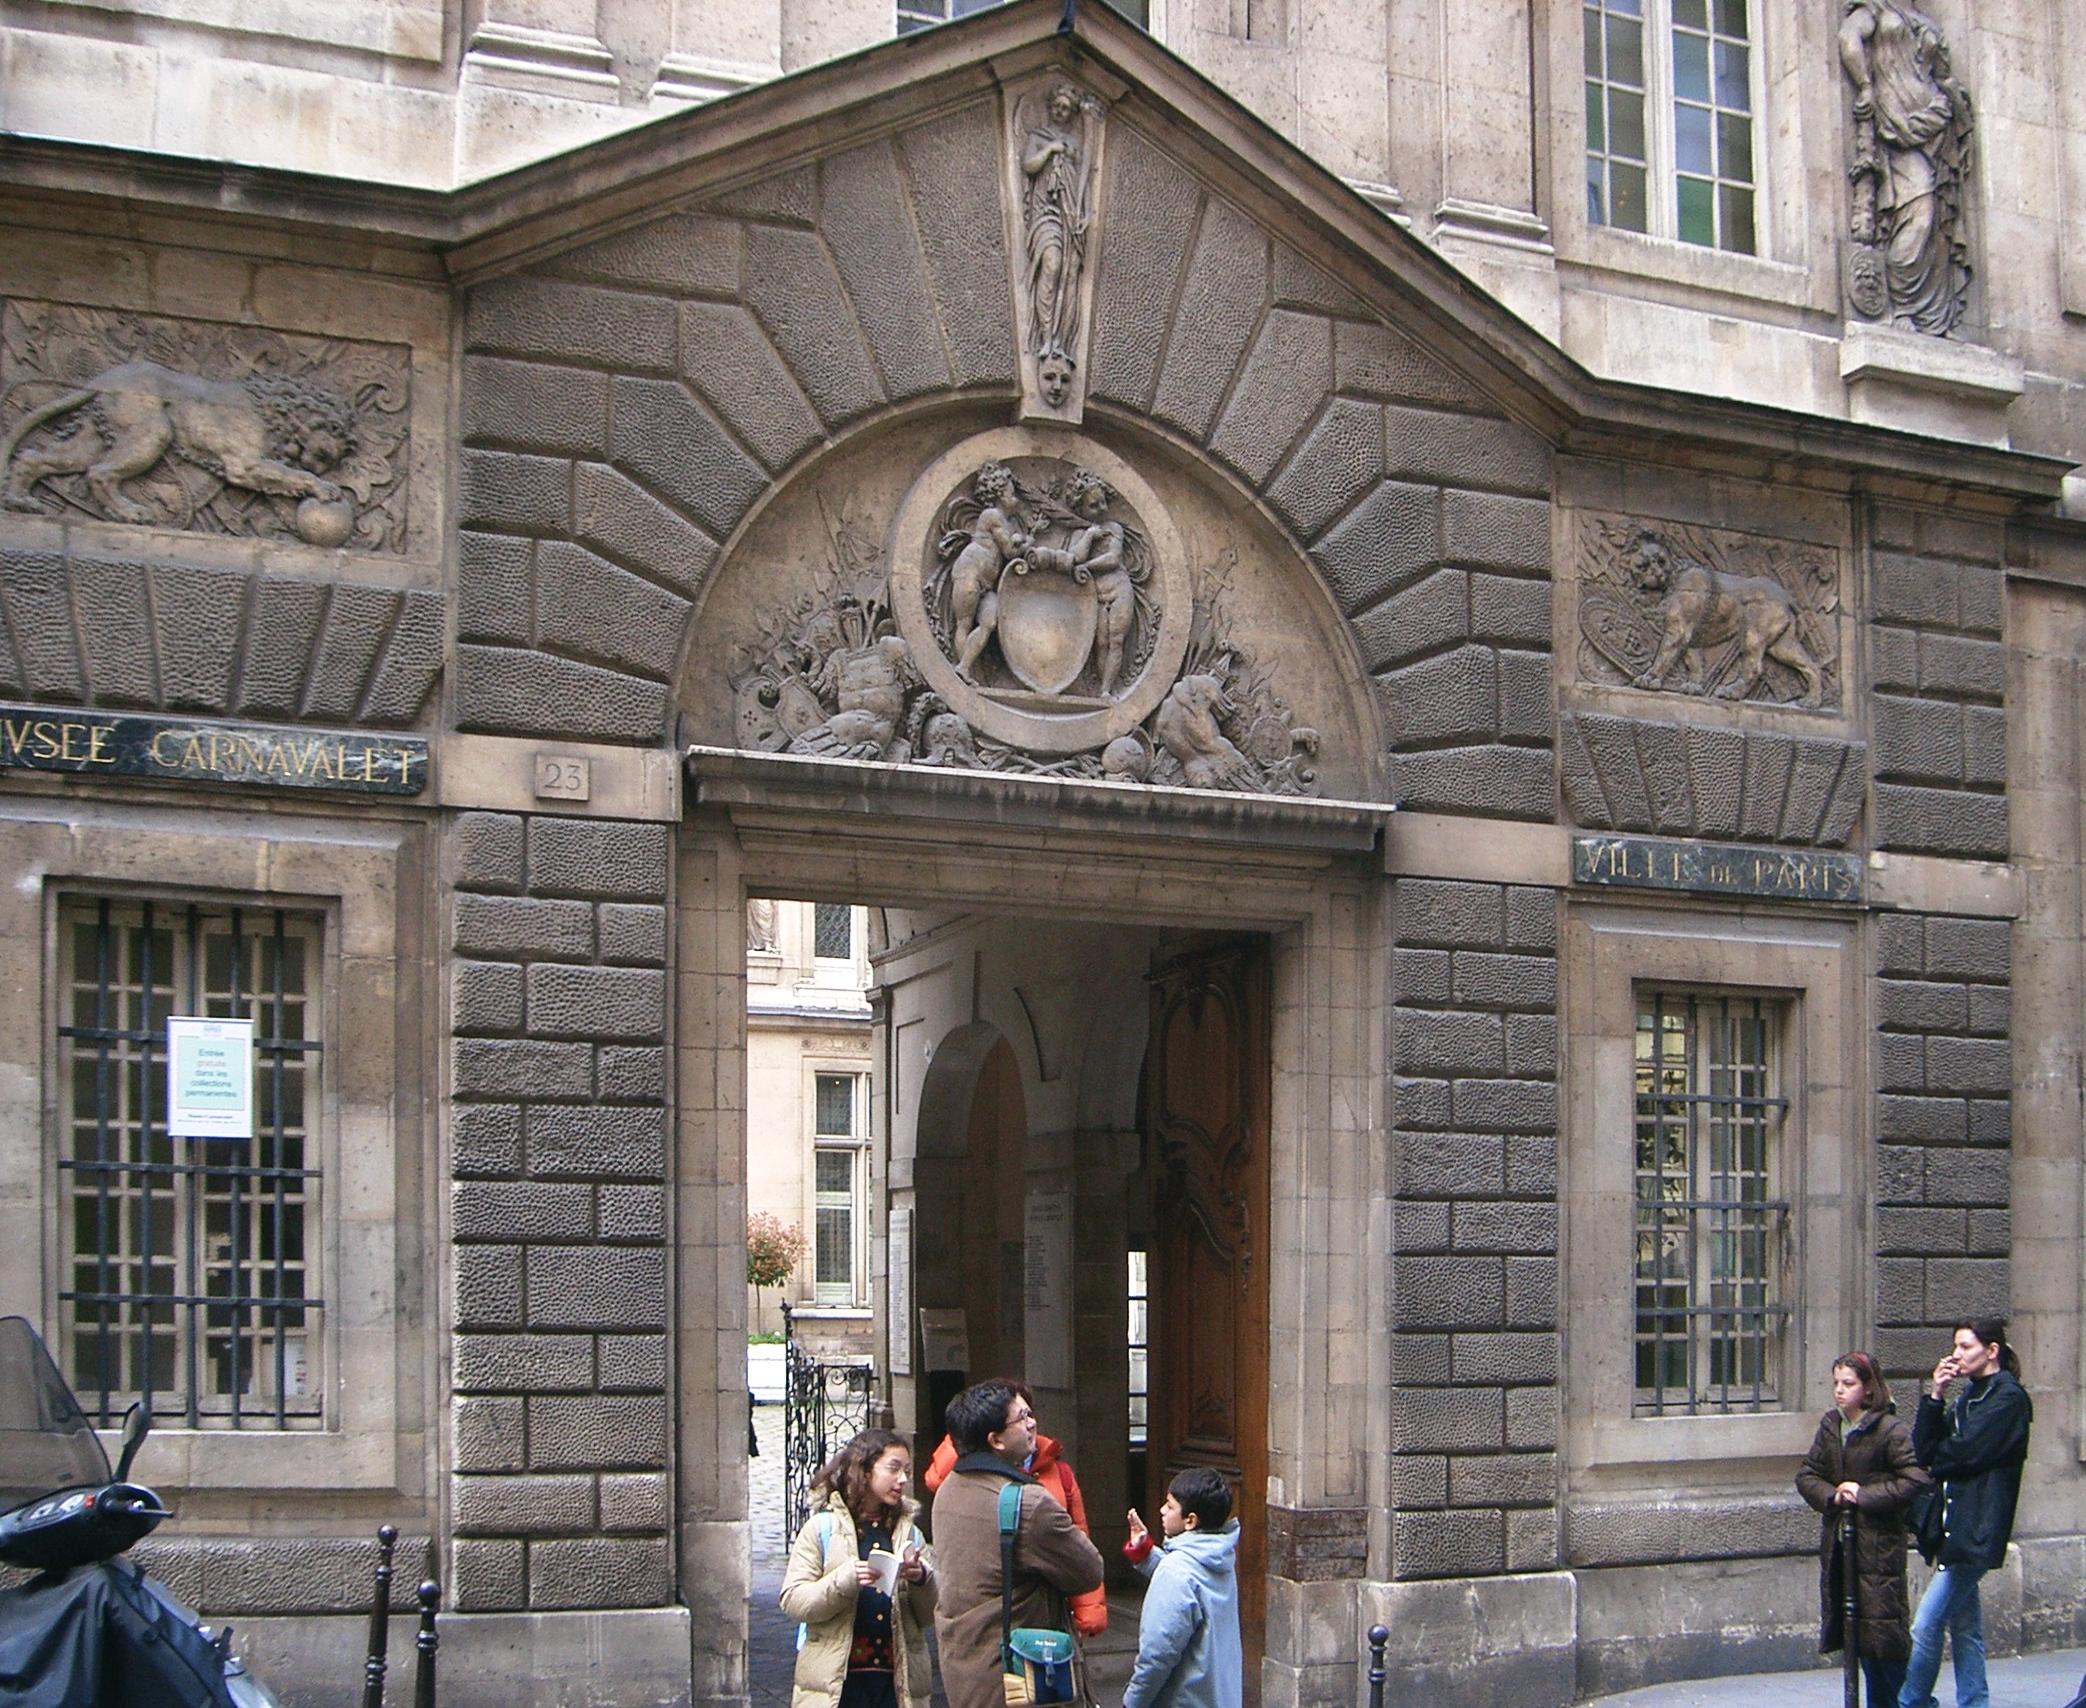 Musée Carnavalet - Wikipedia